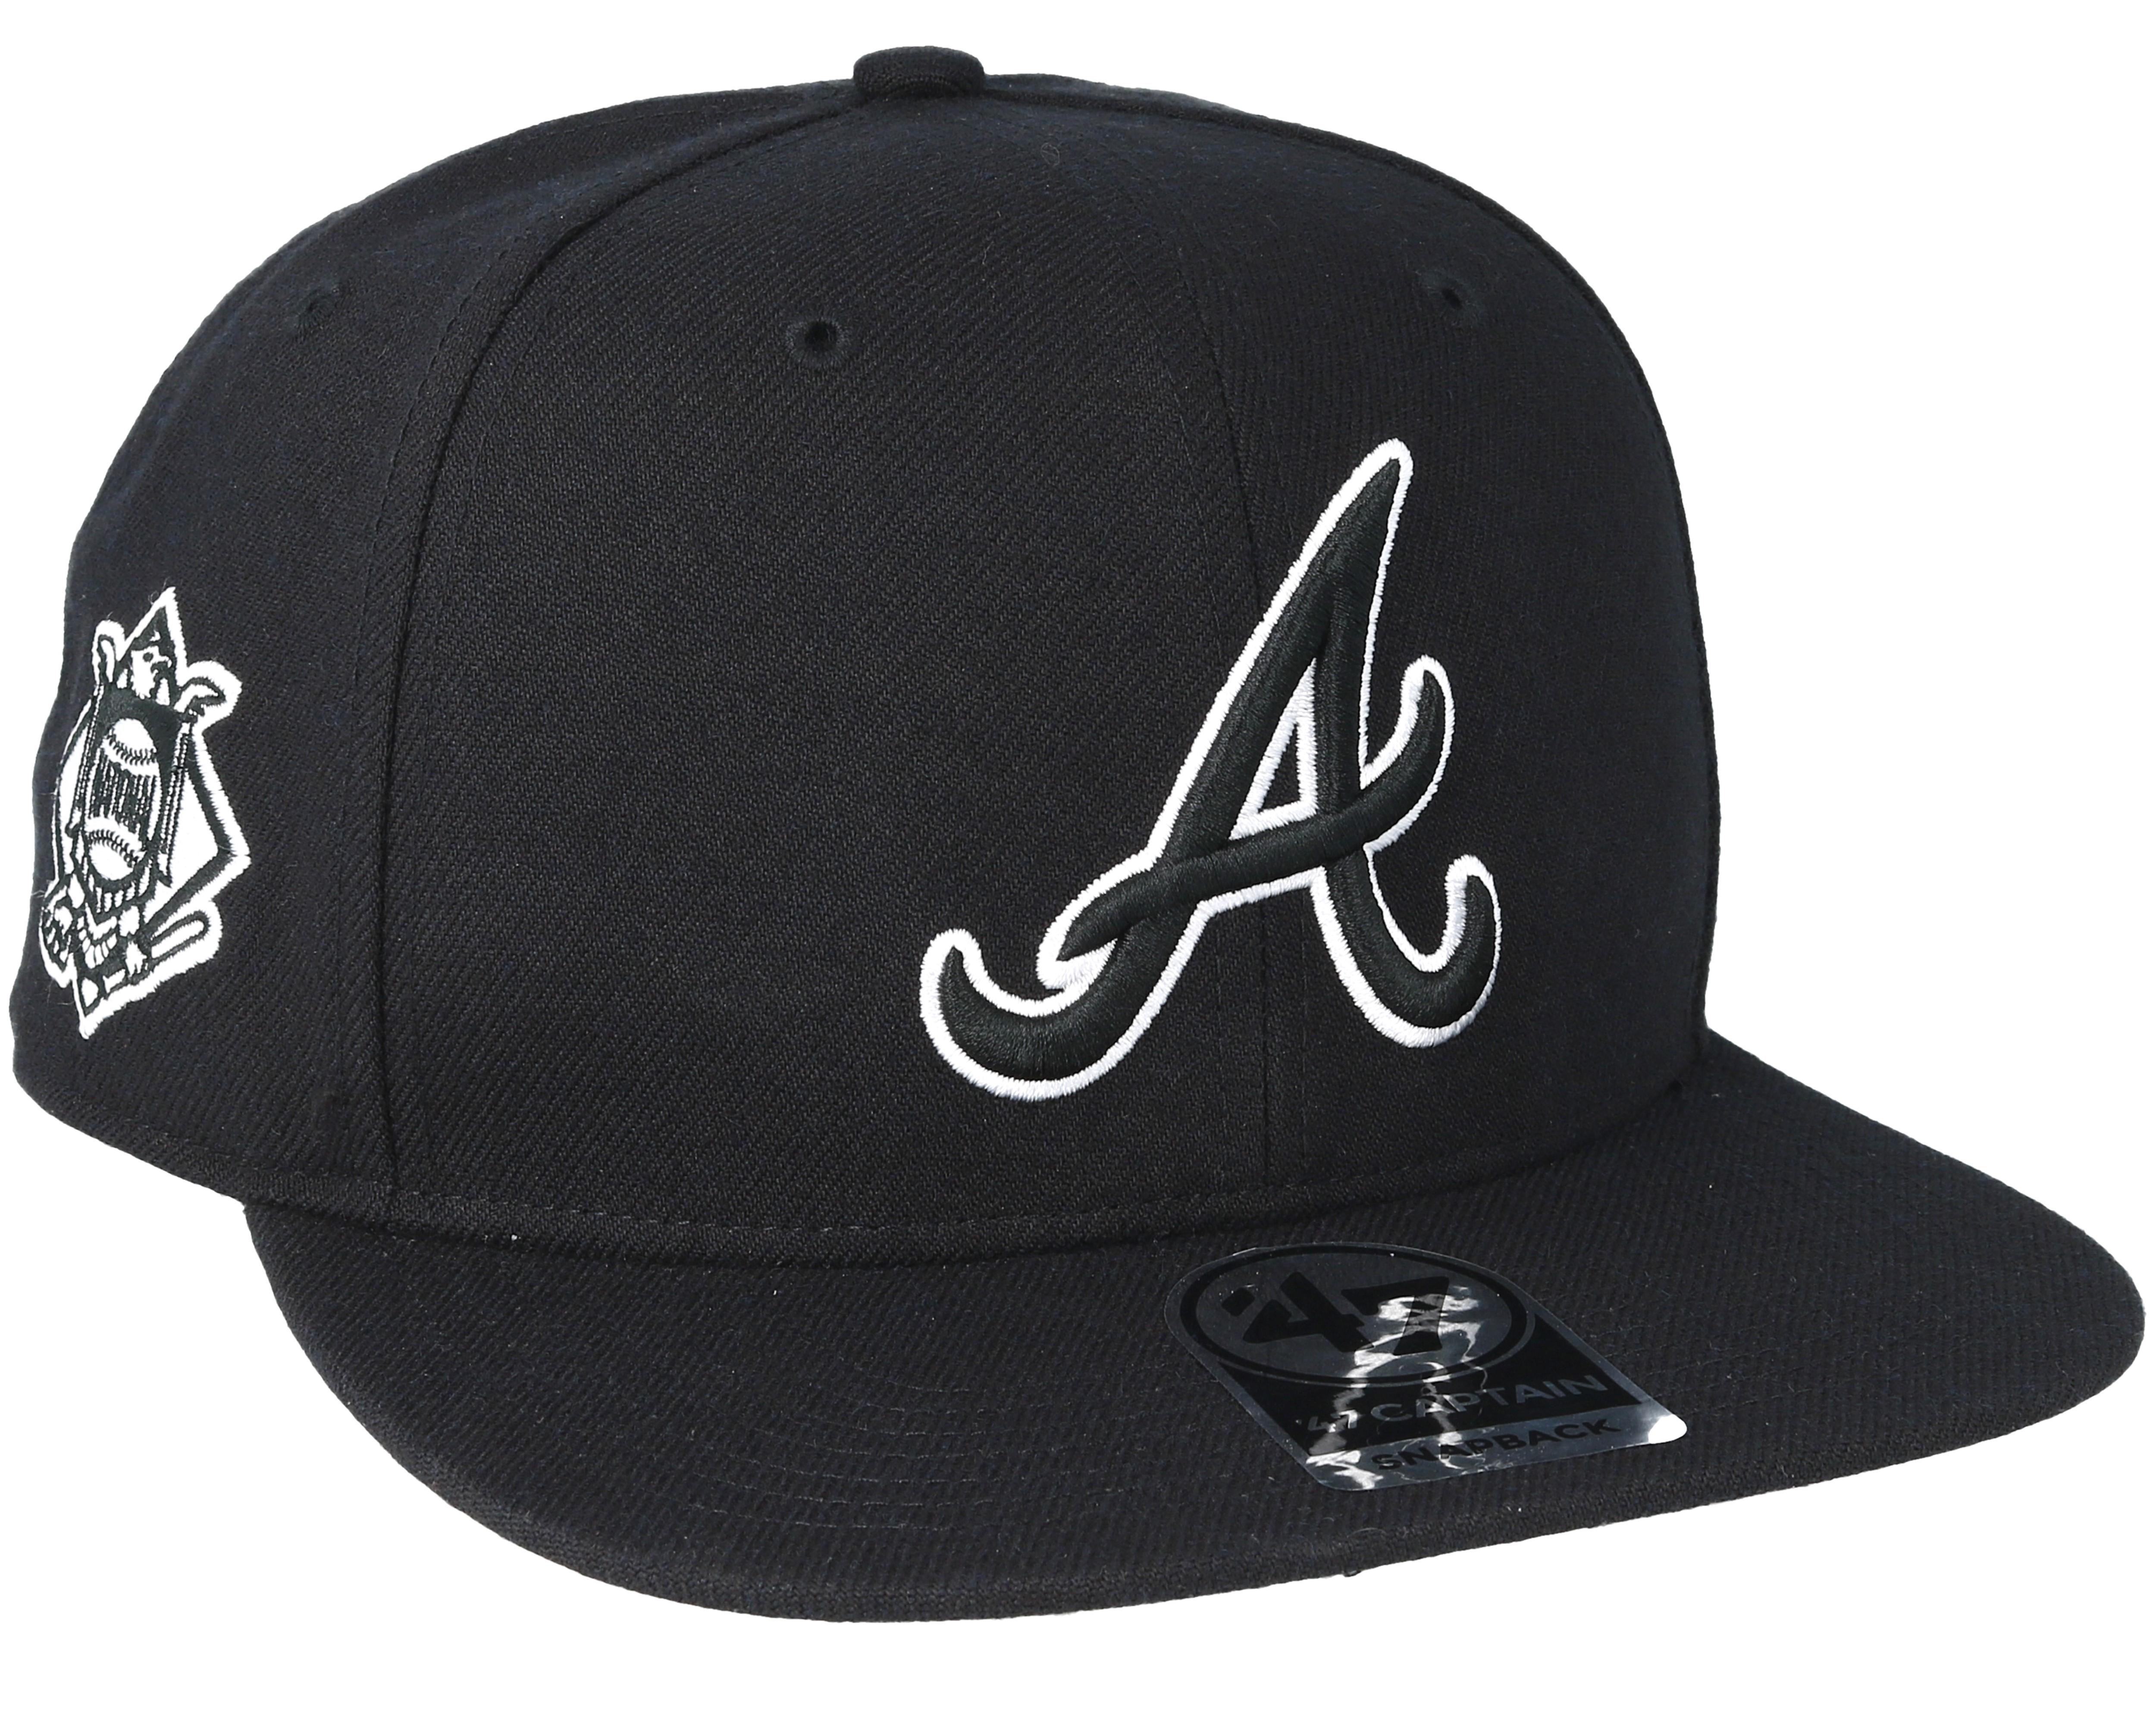 Atlanta Braves Sure Shot Black Snapback - 47 Brand caps  a81d5c4022b4